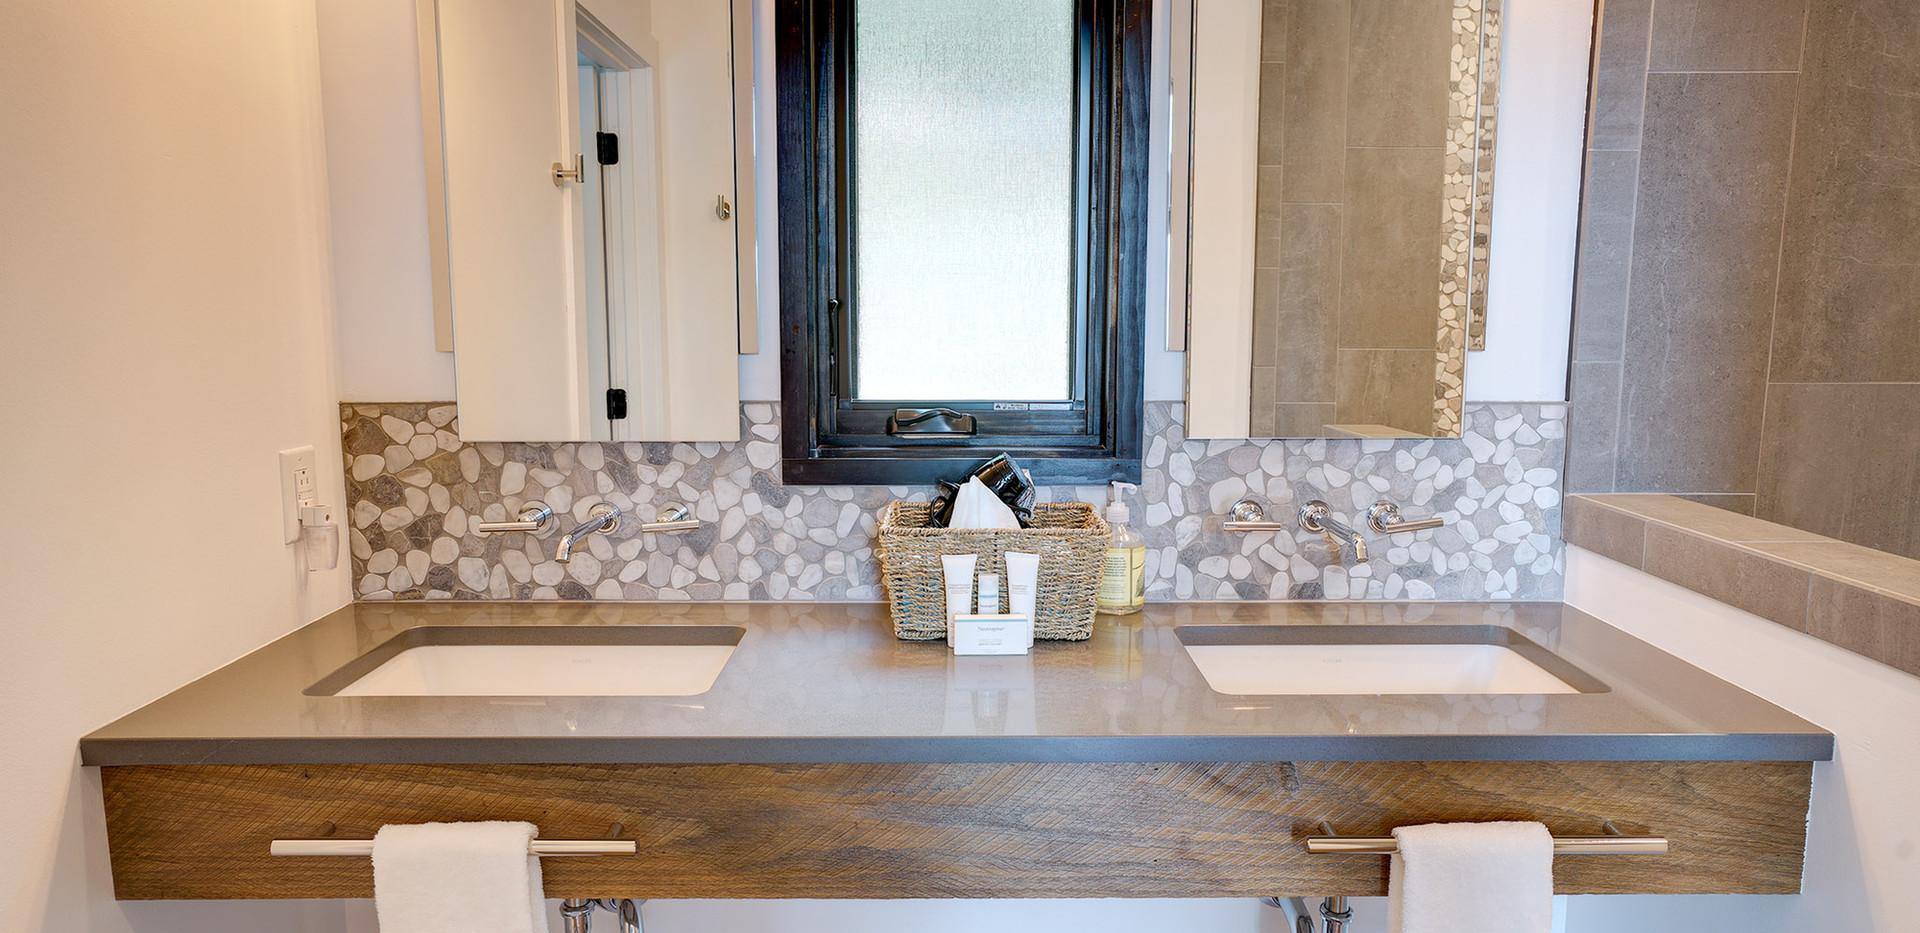 Sunset Falls - master bath vanity